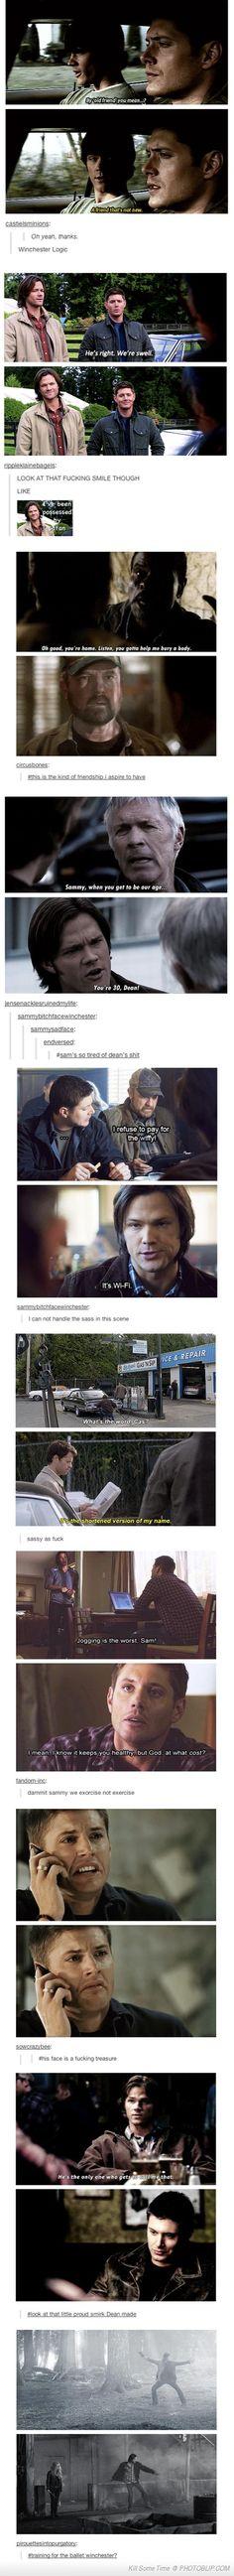 Oh my gosh supernatural ;) <3